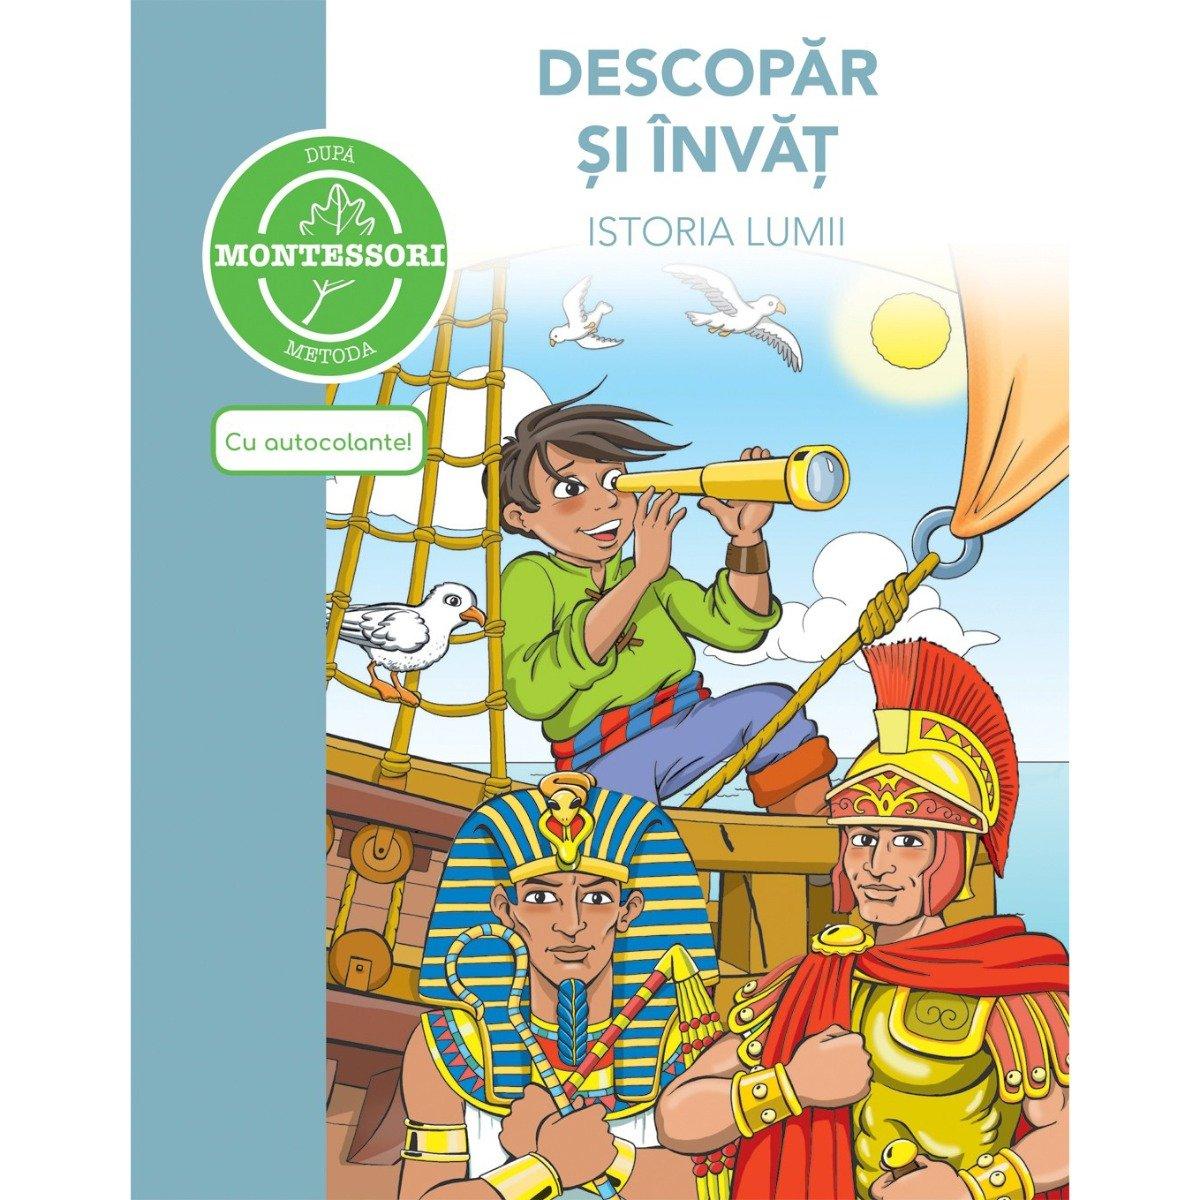 Carte Descopar si invat istoria lumii - dupa metoda Montessori, Editura DPH imagine 2021